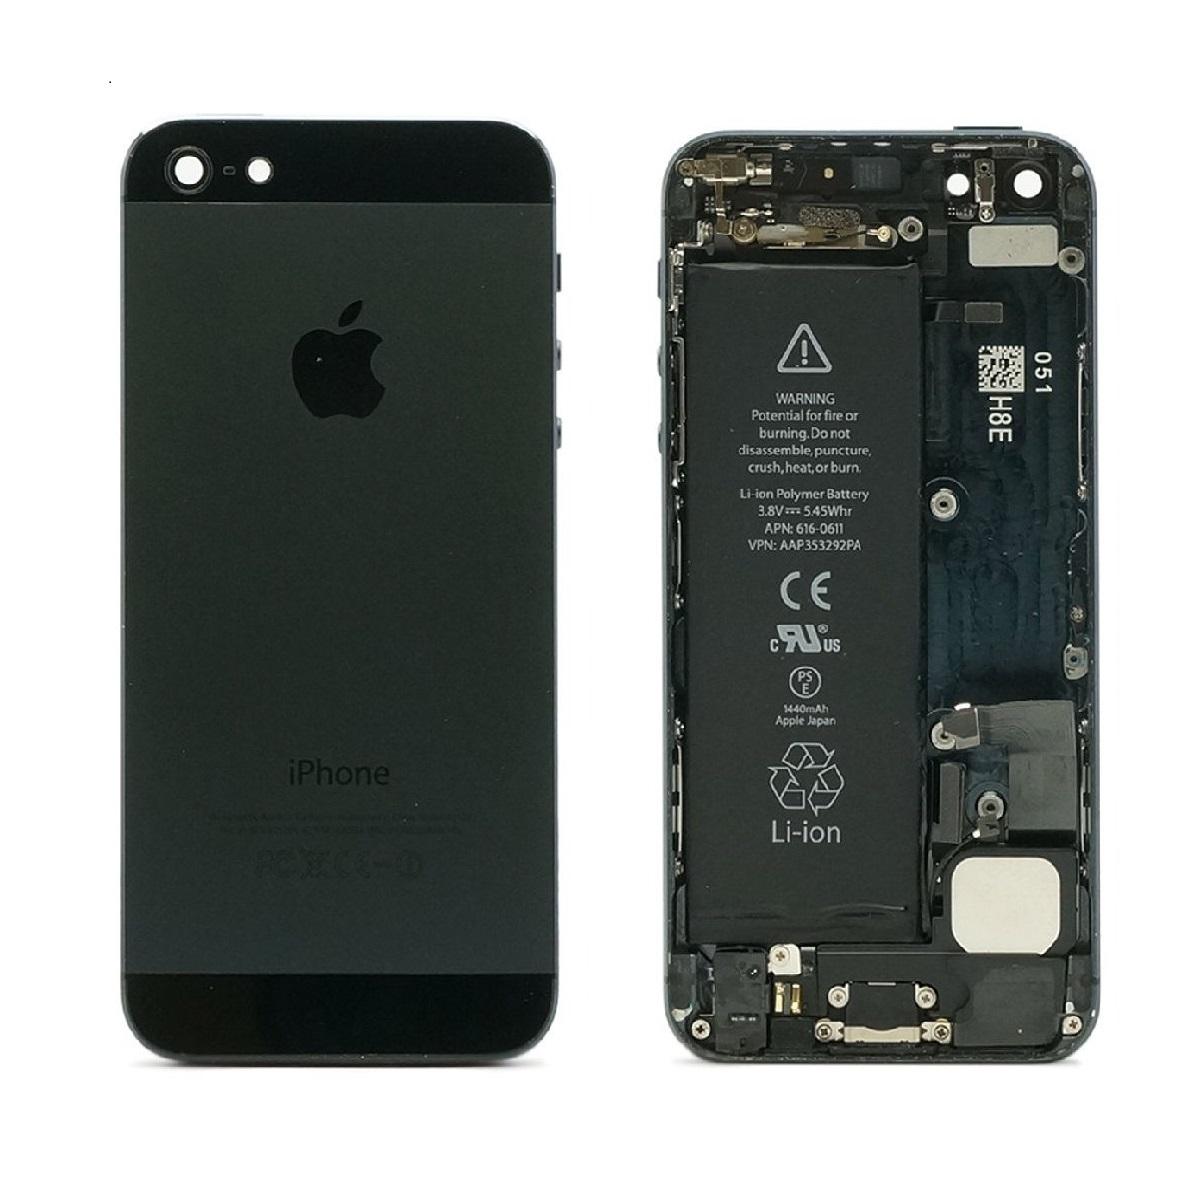 mint refurbished original apple iphone 5 5c 5s 6 6s 6s plus housing assembly ebay. Black Bedroom Furniture Sets. Home Design Ideas